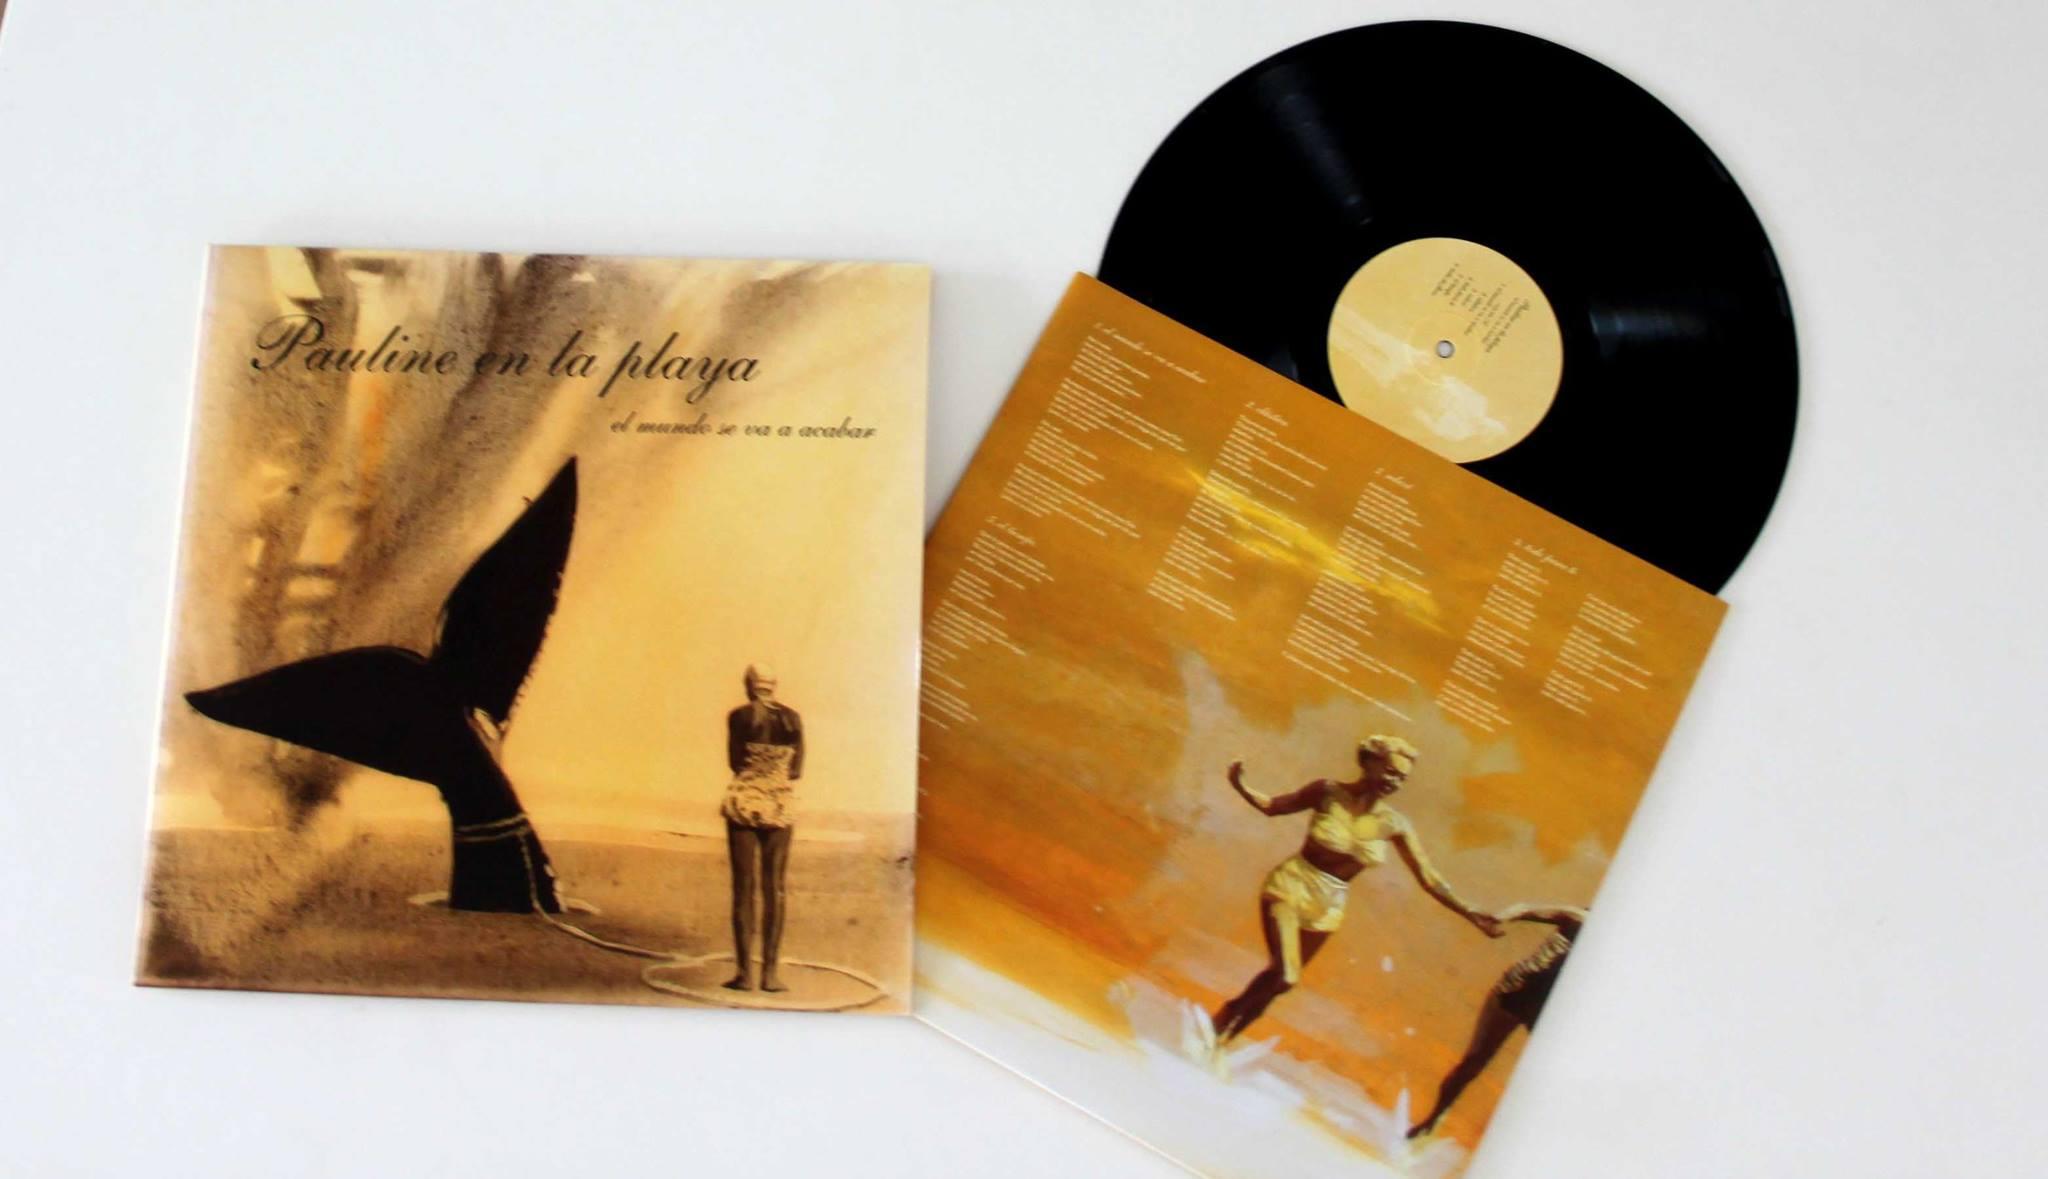 'Pauline en la playa' new album cover